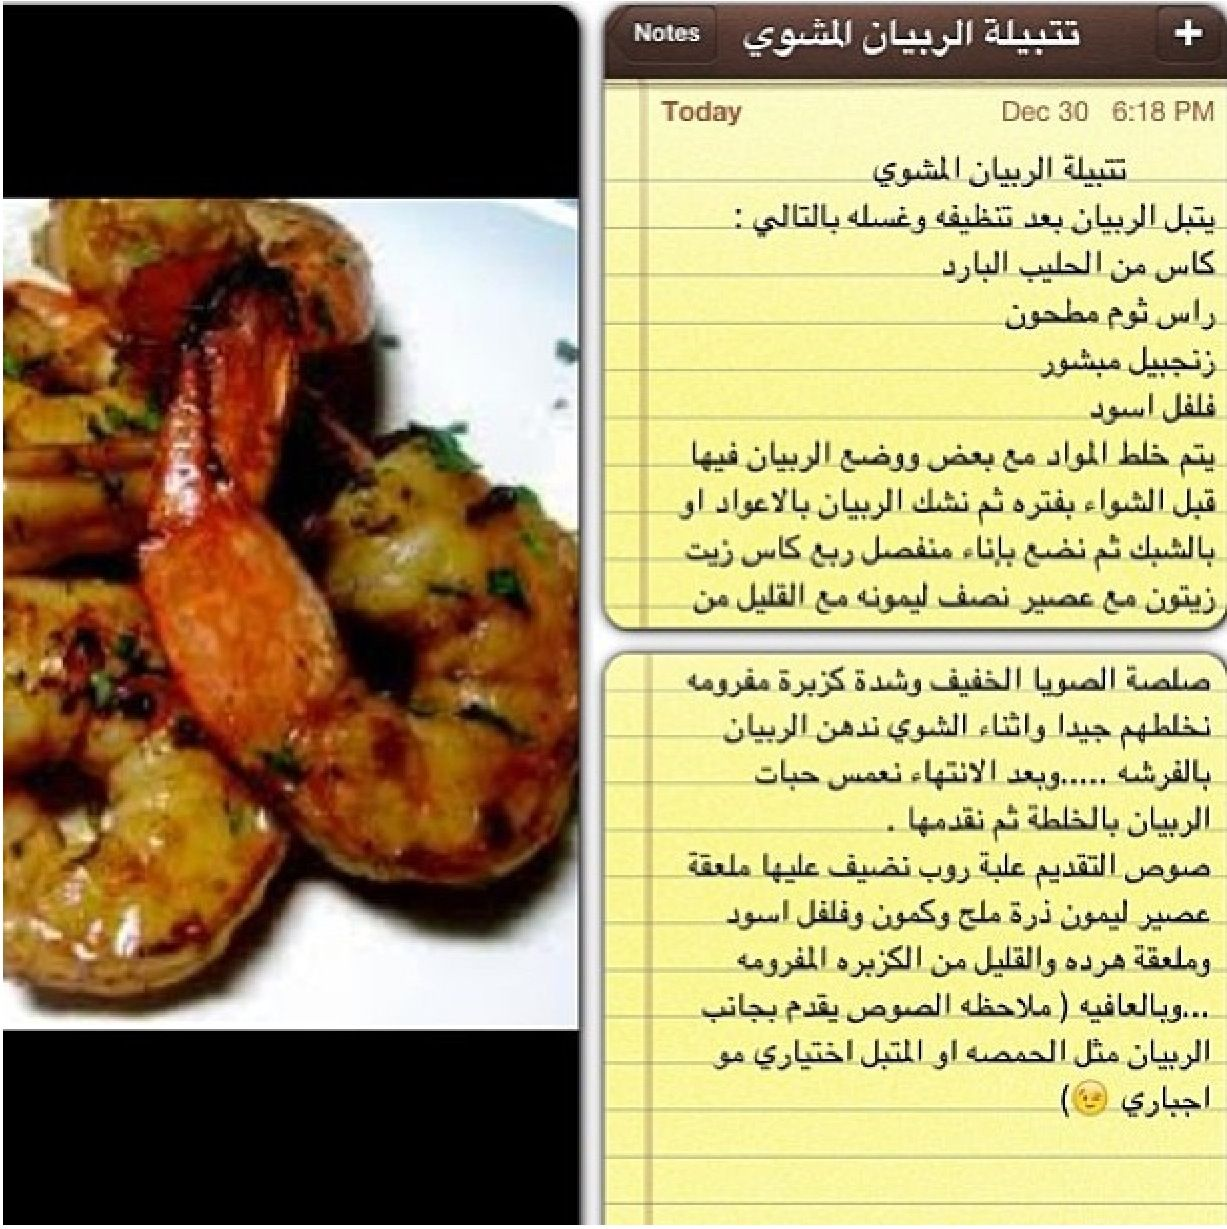 ربيان مشوي Food Receipes Grilling Recipes Arabic Food